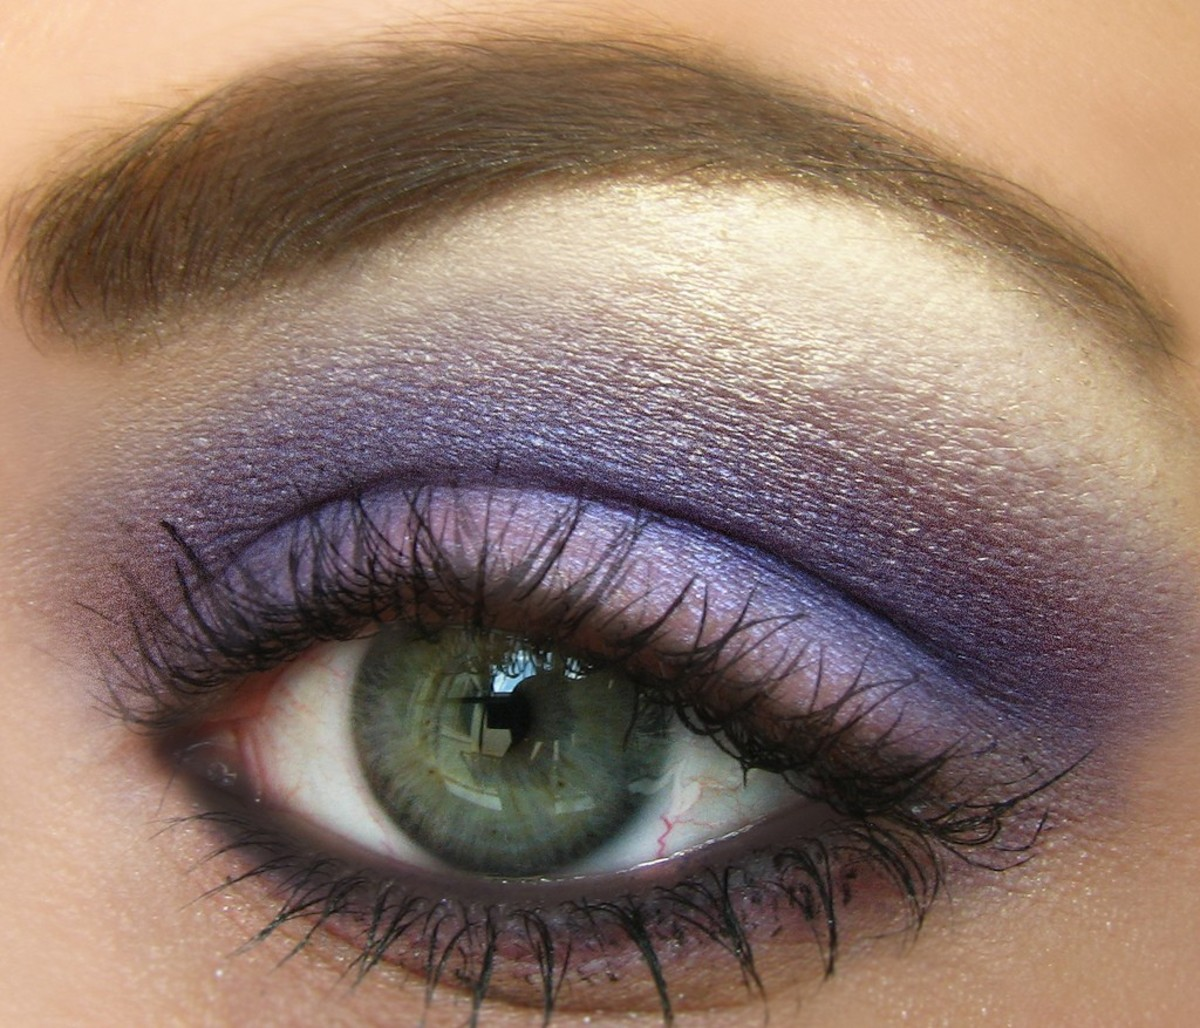 The Best Makeup For Sensitive Eyes